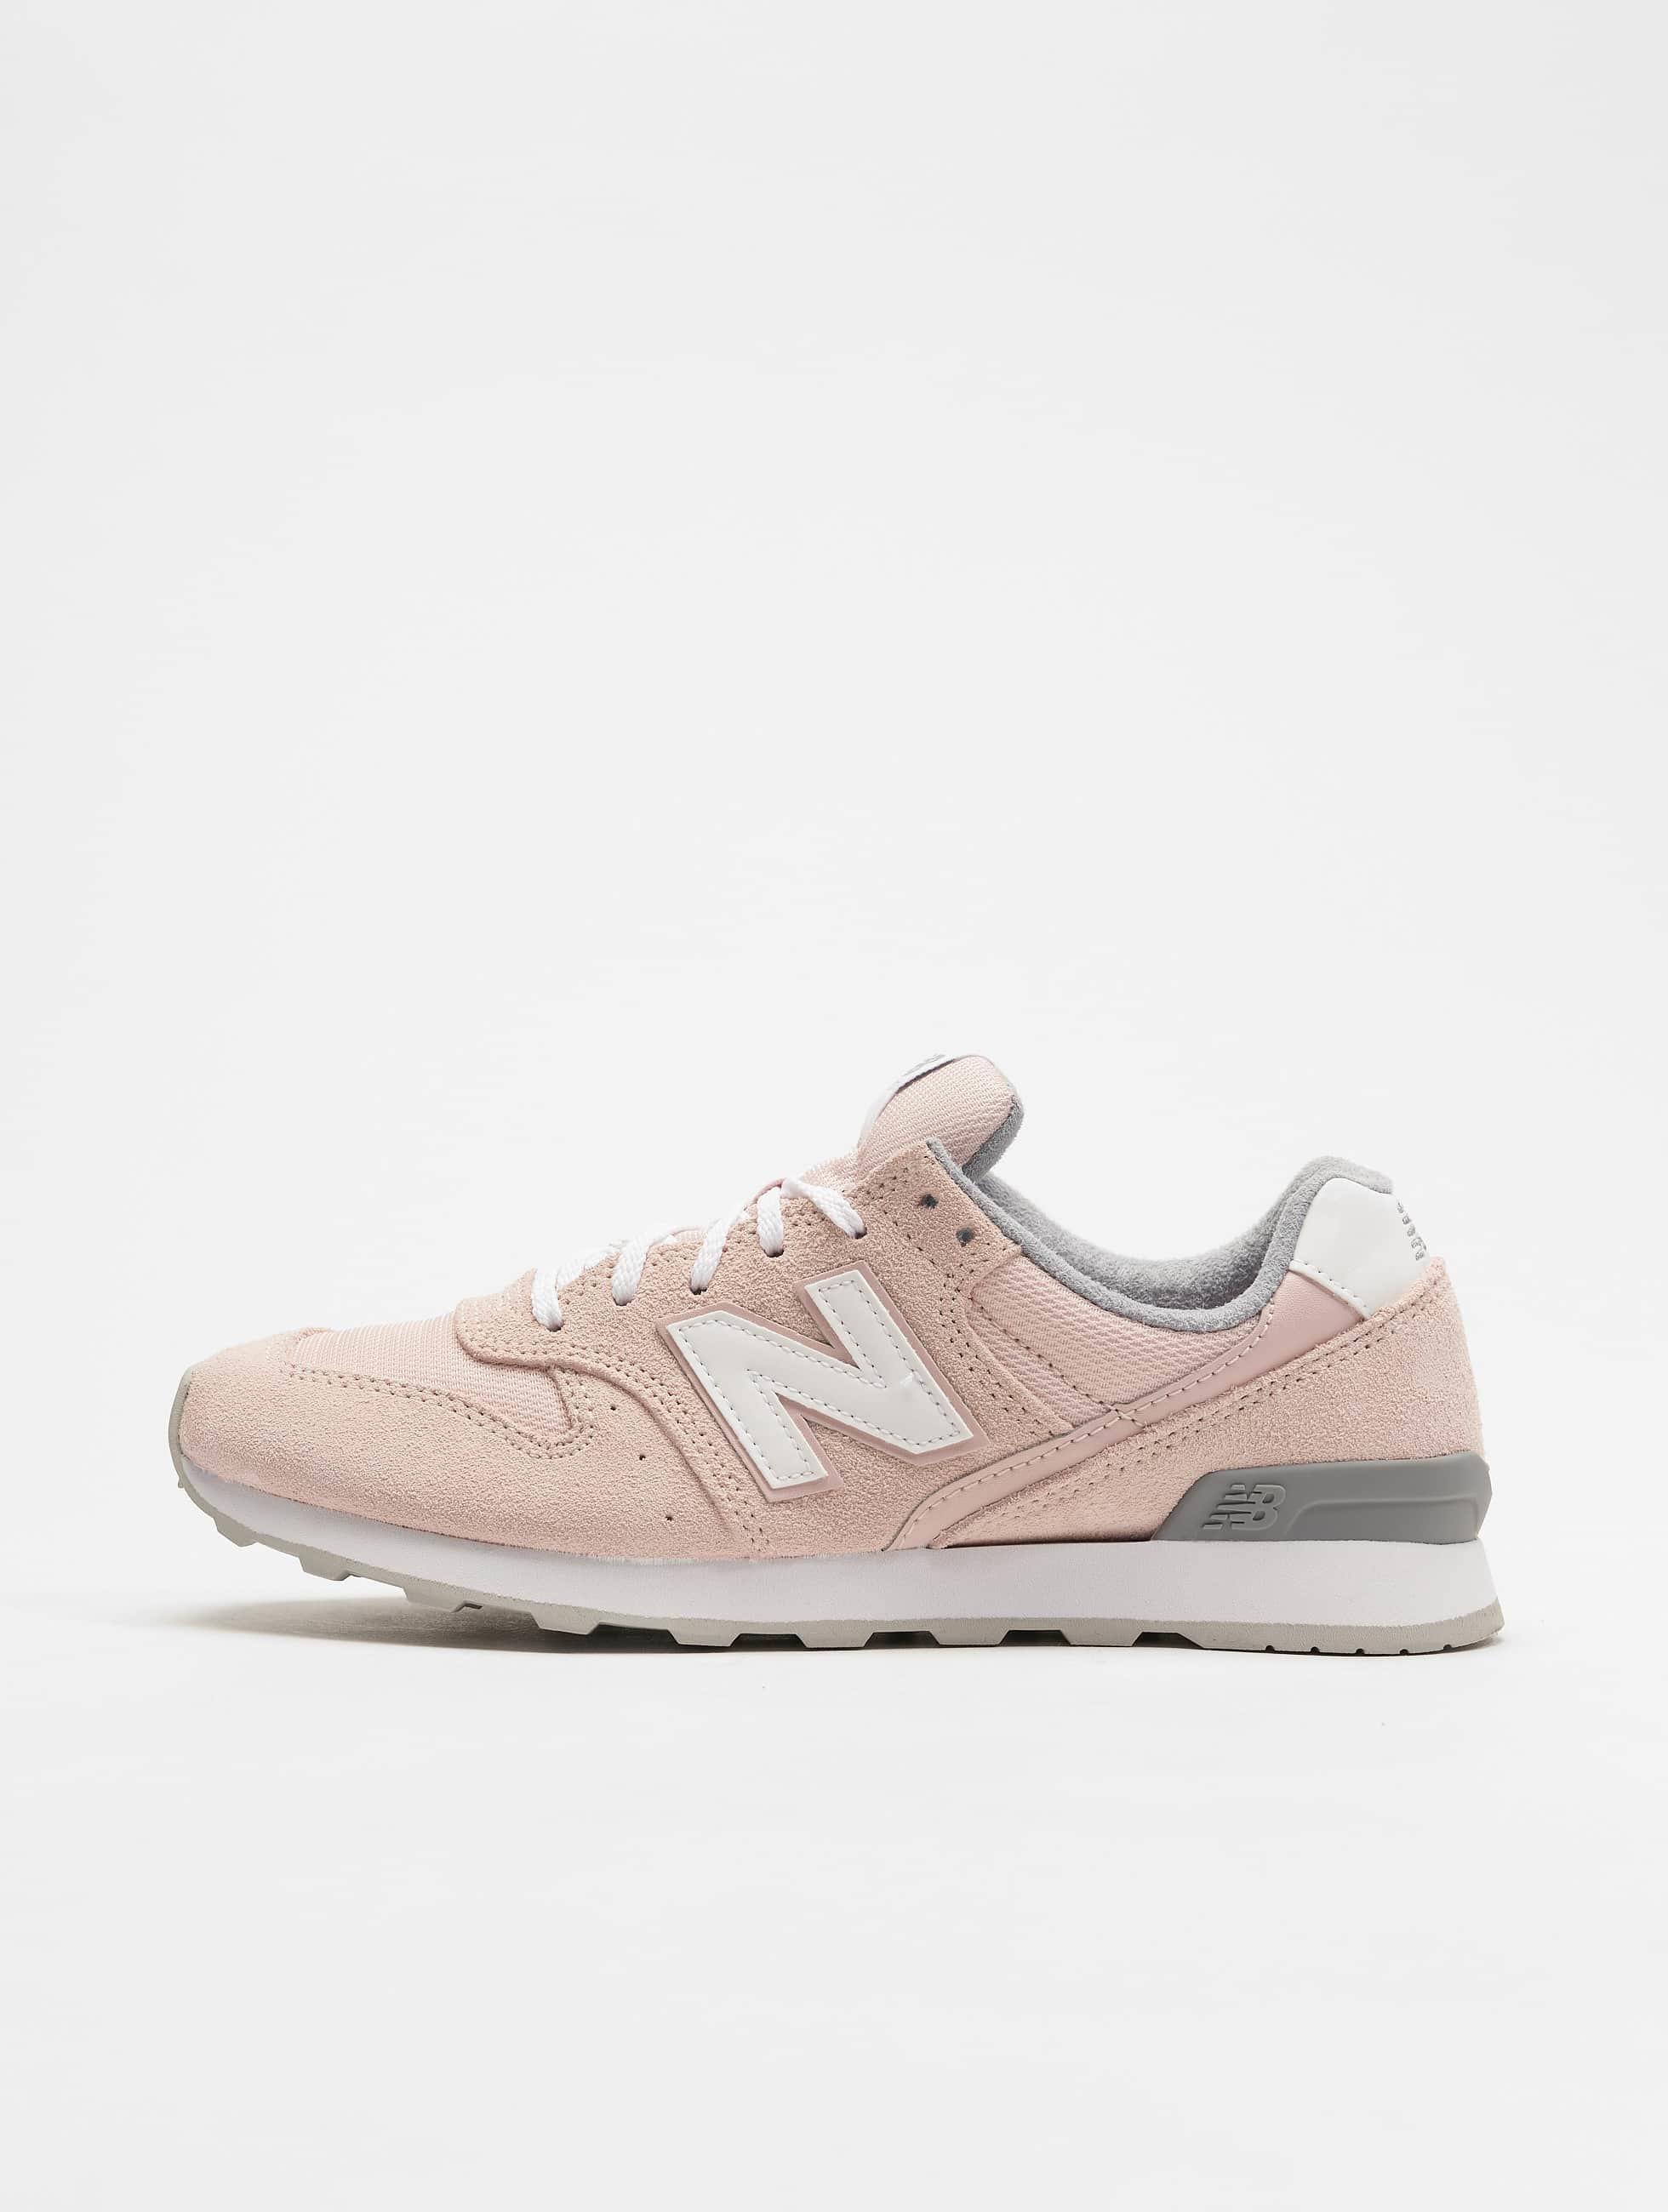 New Balance Damen Sneaker Rosa | B2B